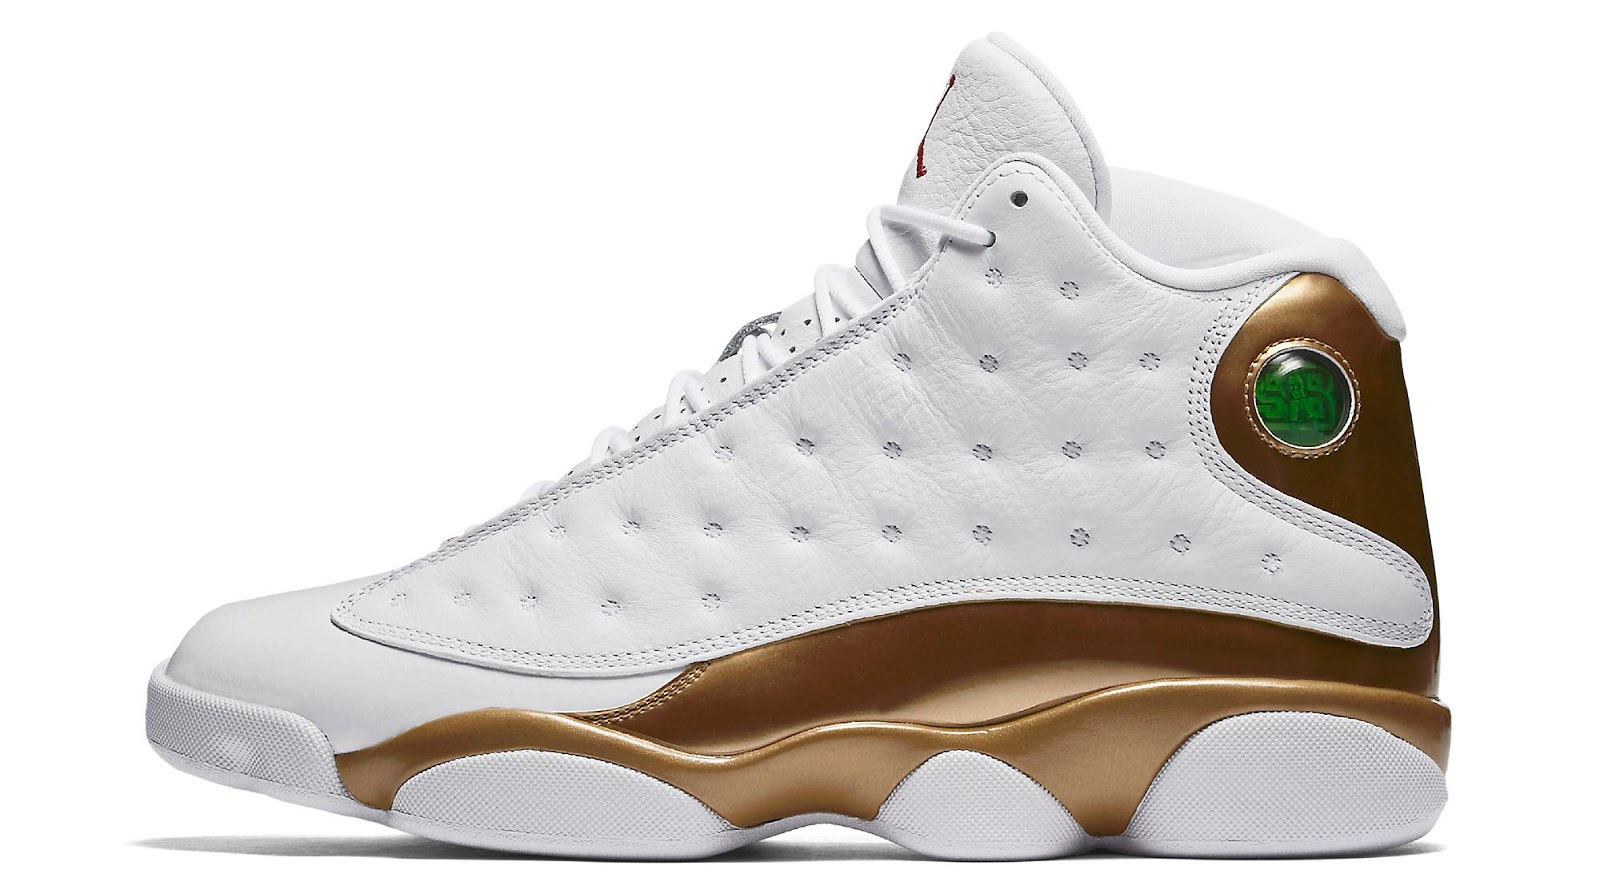 timeless design bf24e 16665 ajordanxi Your  1 Source For Sneaker Release Dates  Air Jordan DMP ...